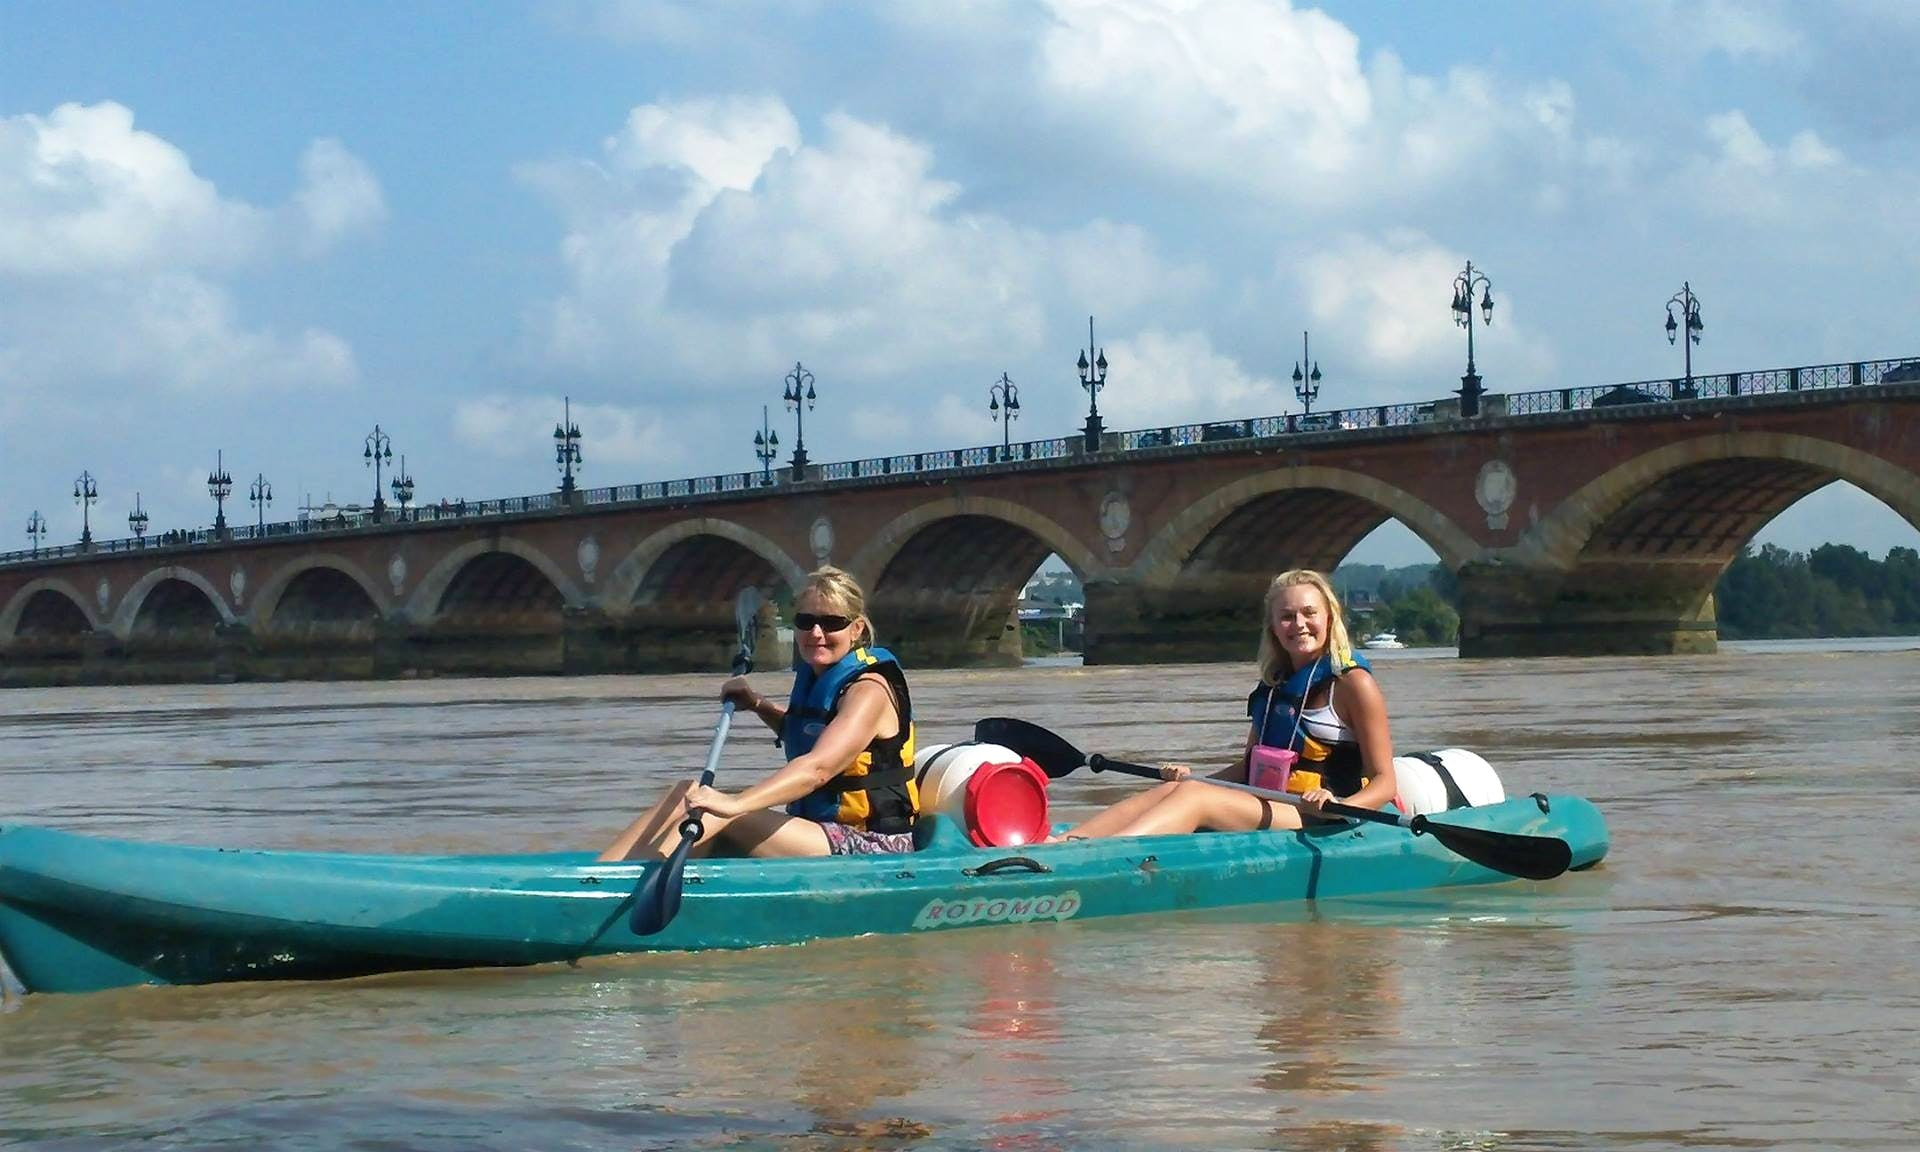 Enjoy a 2 seater Kayak Tour in Bègles, France